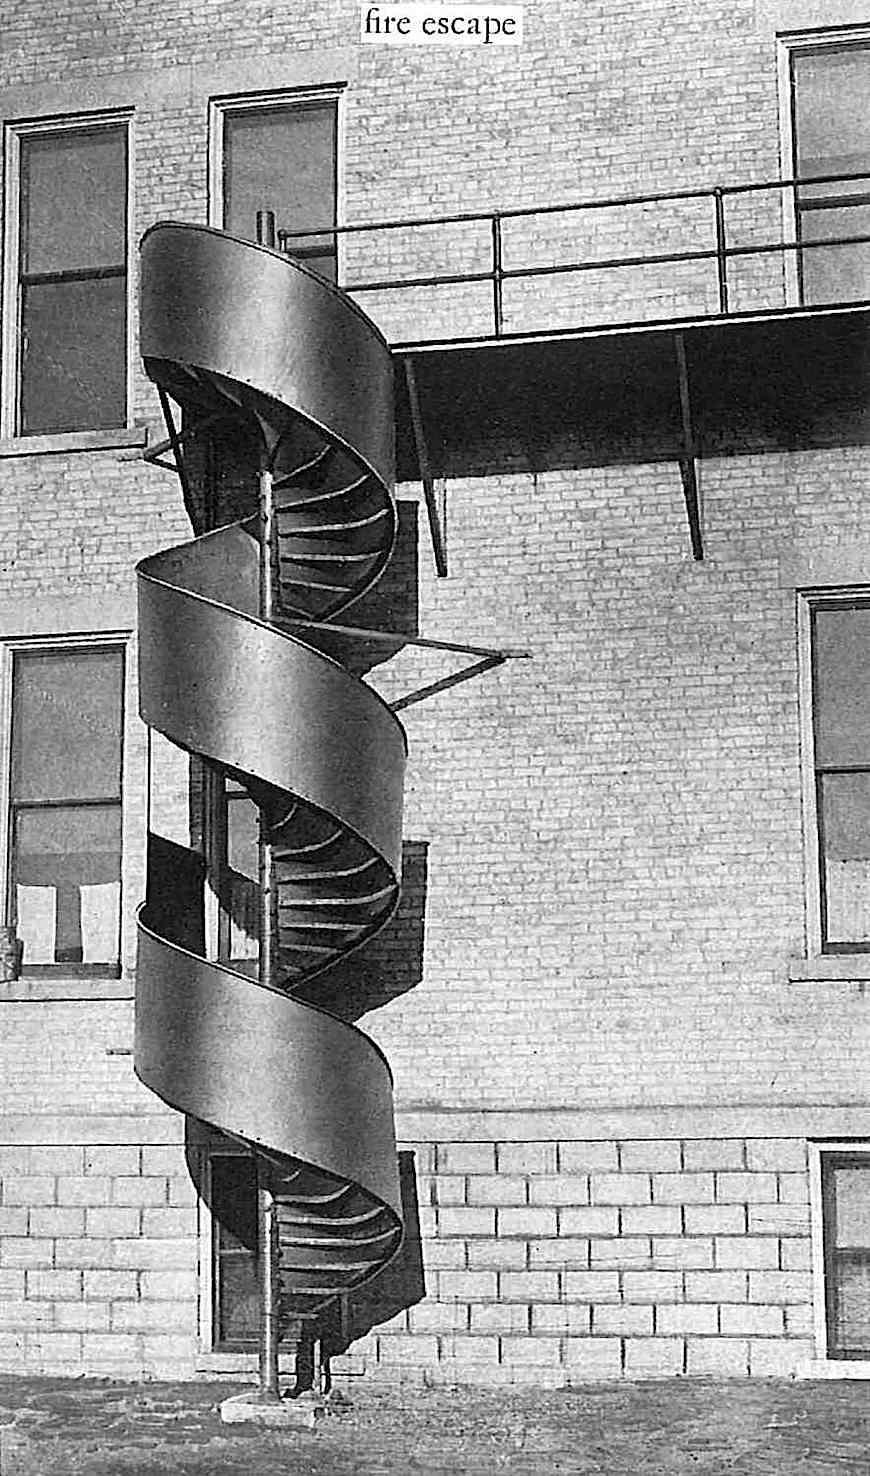 1924 spiral school fire escape, large photograph